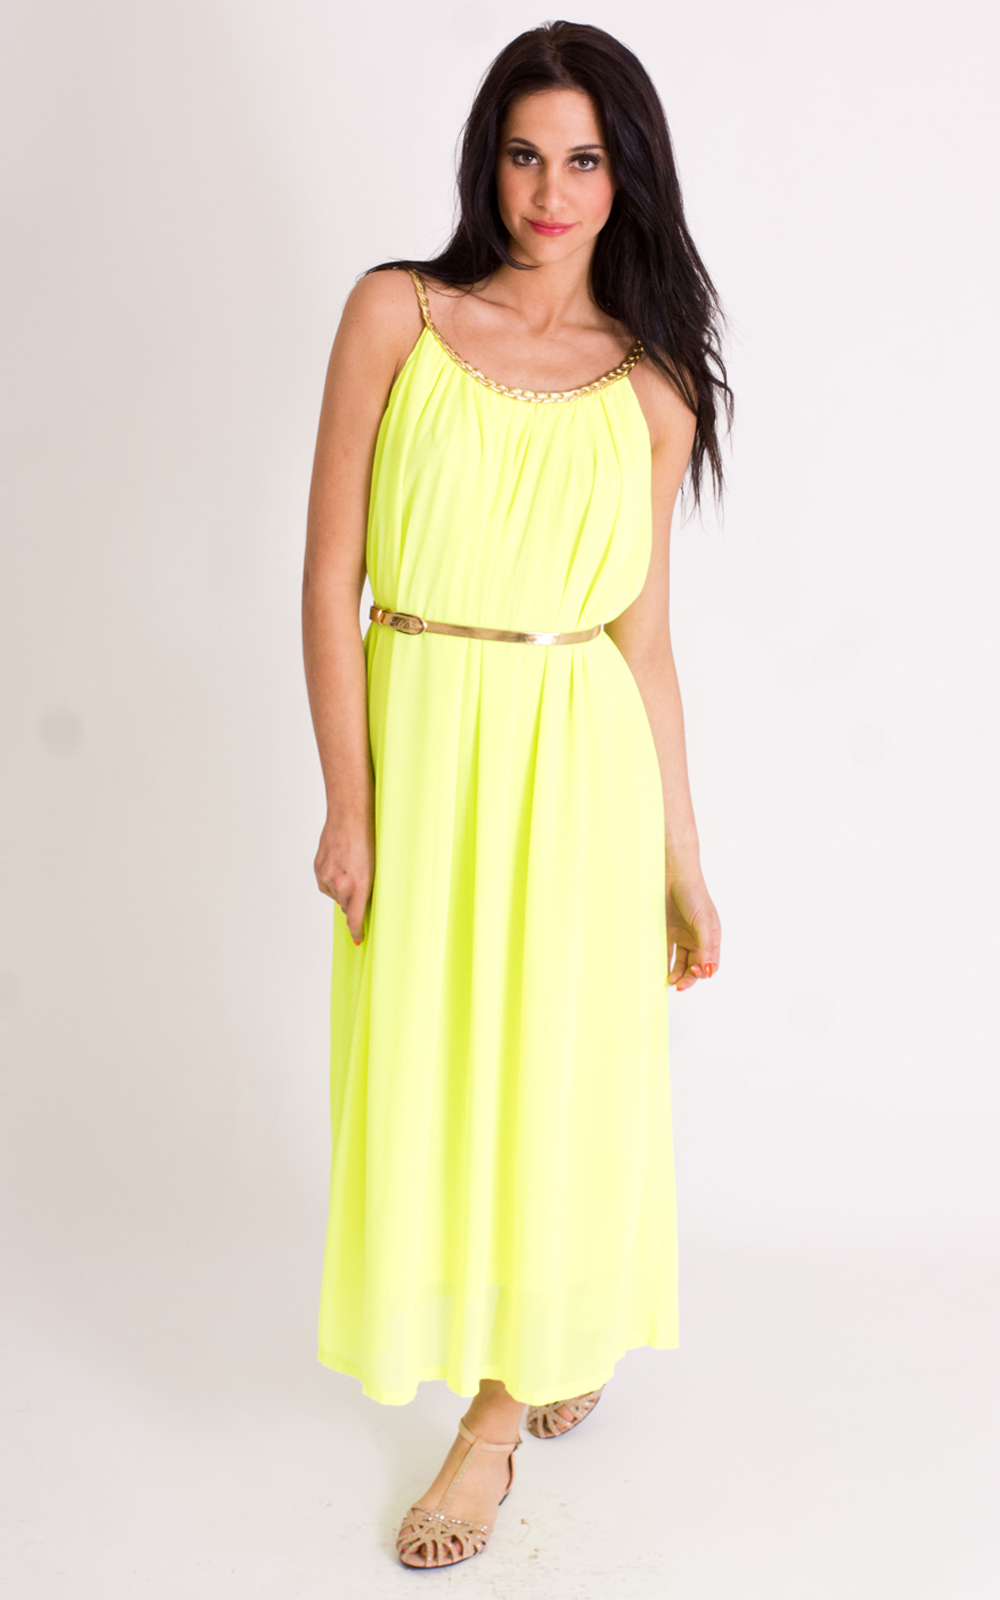 Yellow maxi dress | Shop for cheap Women's Dresses ... - photo #19